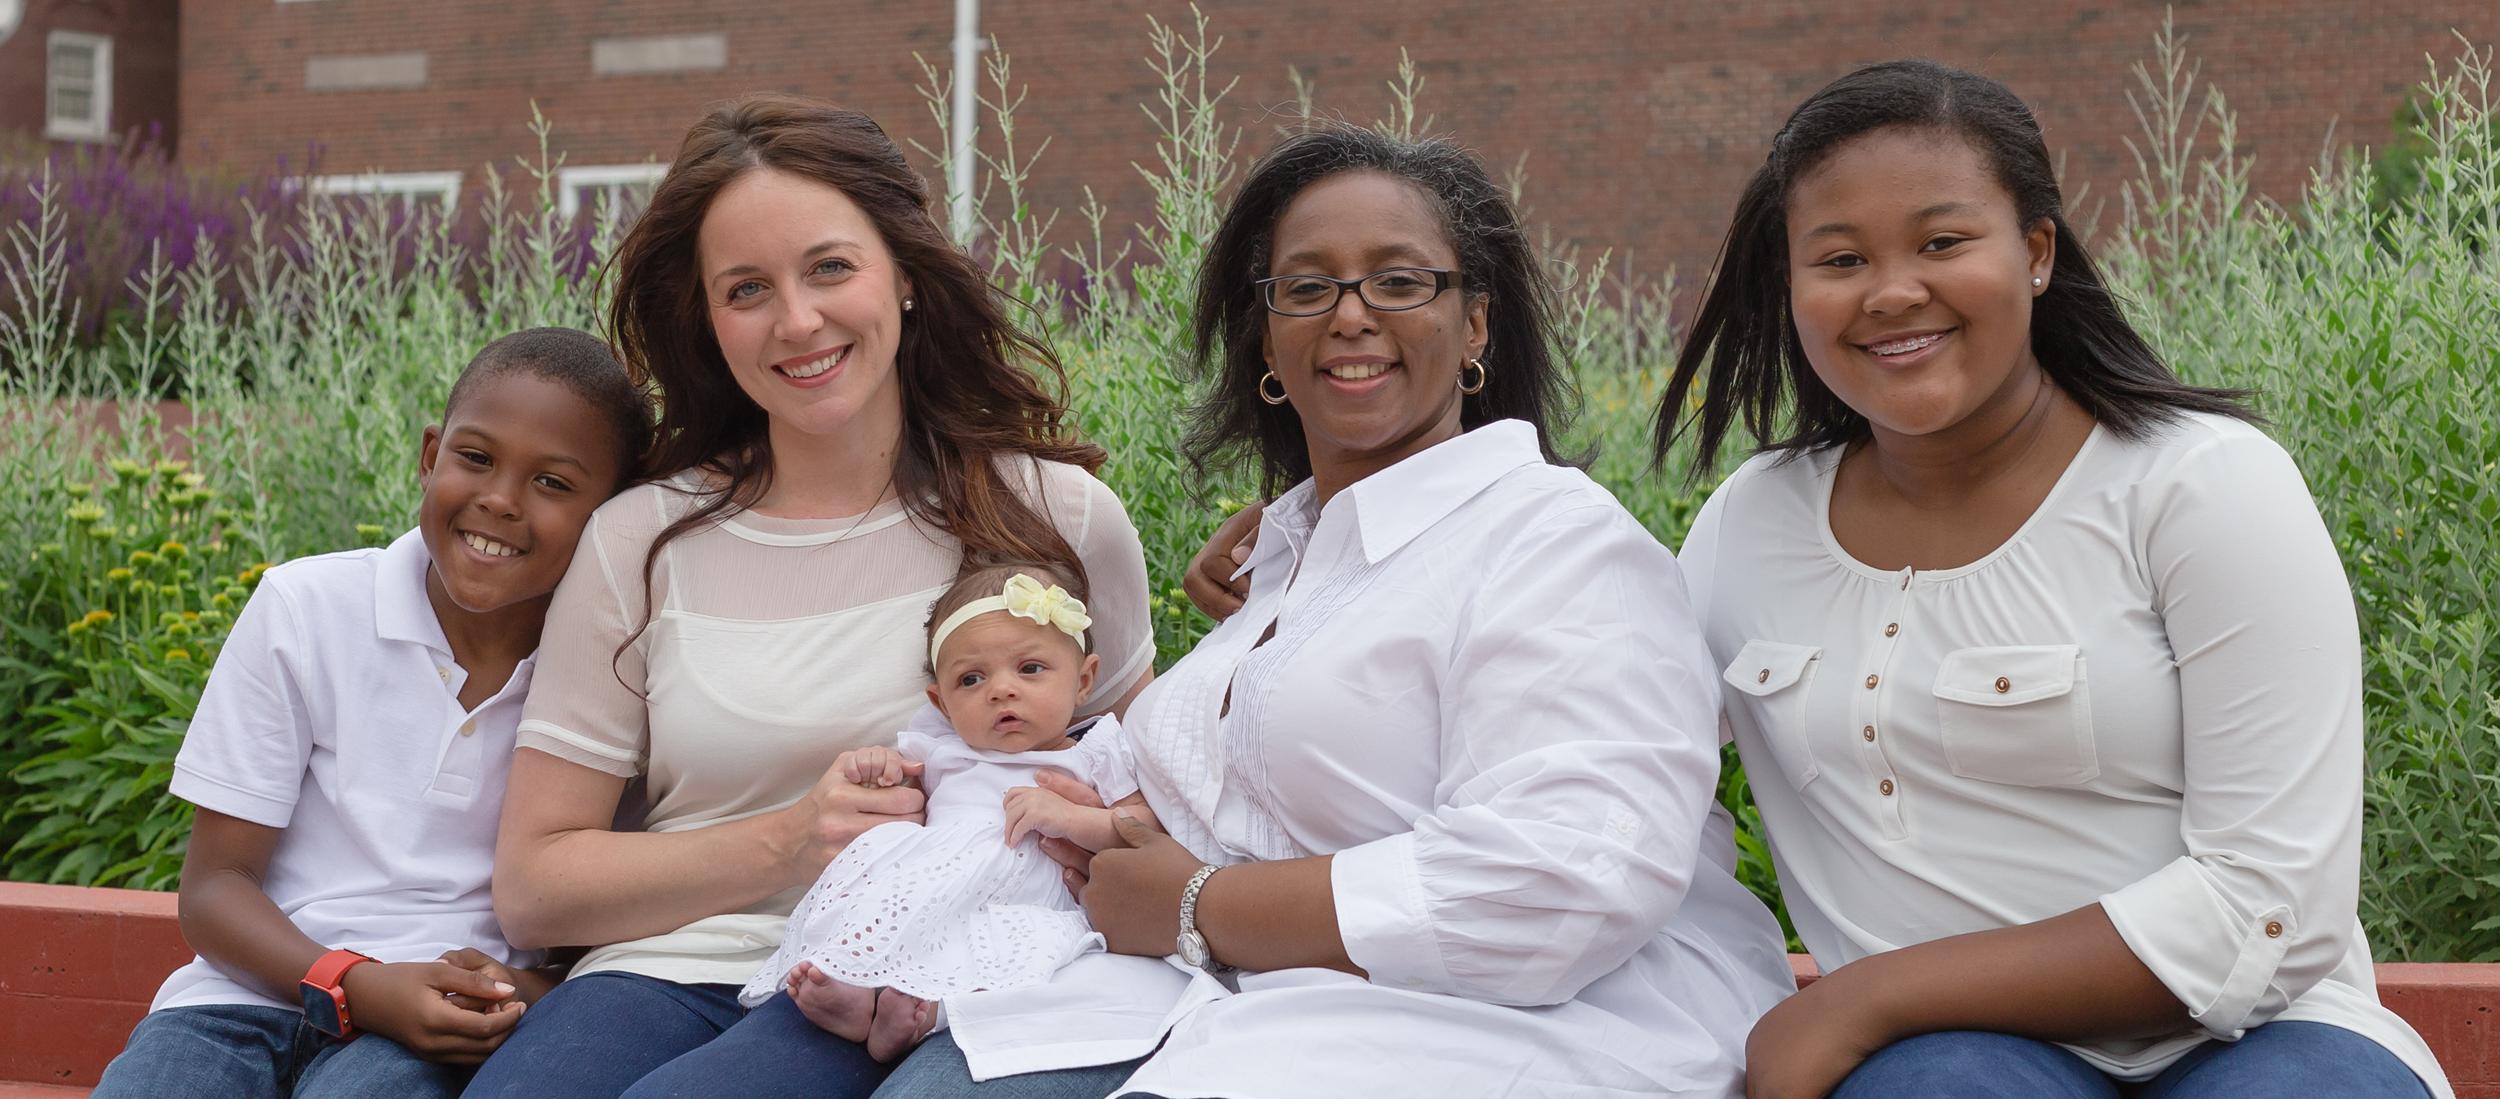 Family Photos Bloomington, IL